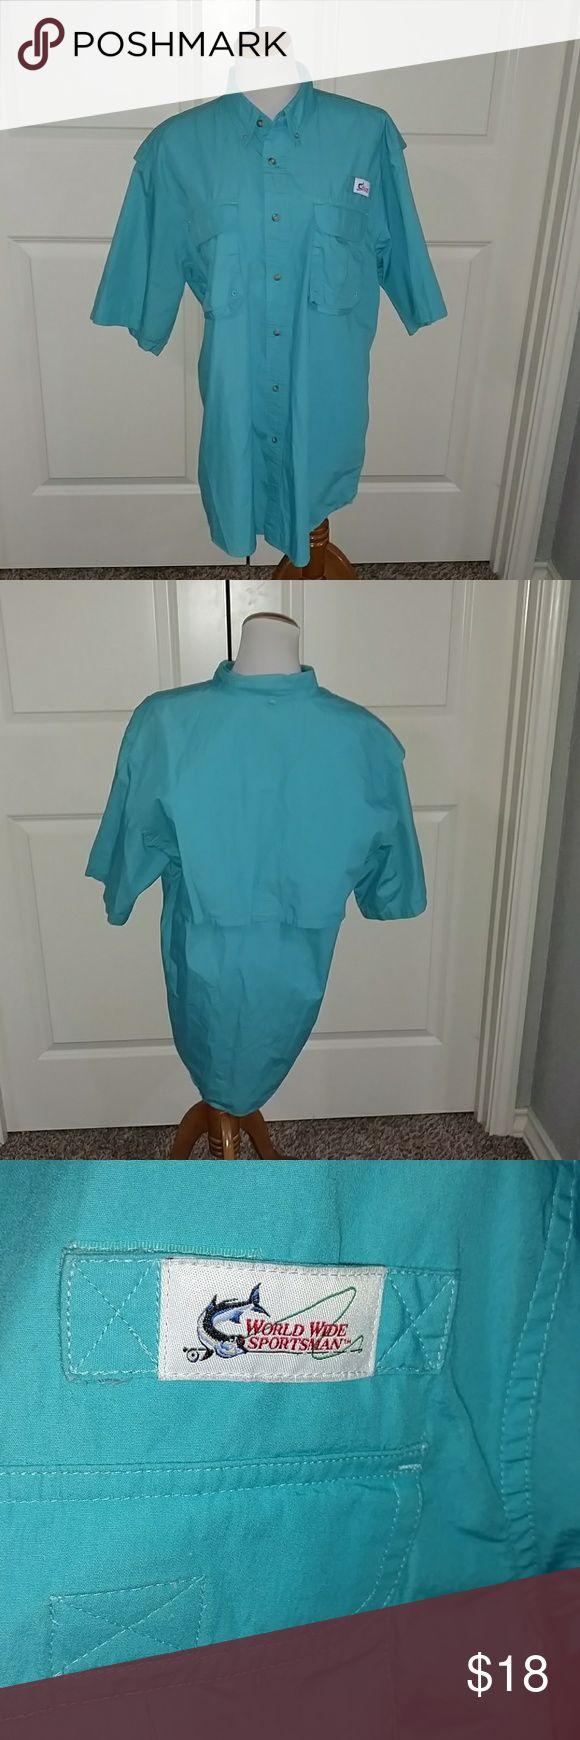 World Wide Sportsman Turquoise Shirt World Wide Sportsman turquoise button down shirt. In excellent condition. Size Large. World Wide Sportsman Shirts Casual Button Down Shirts